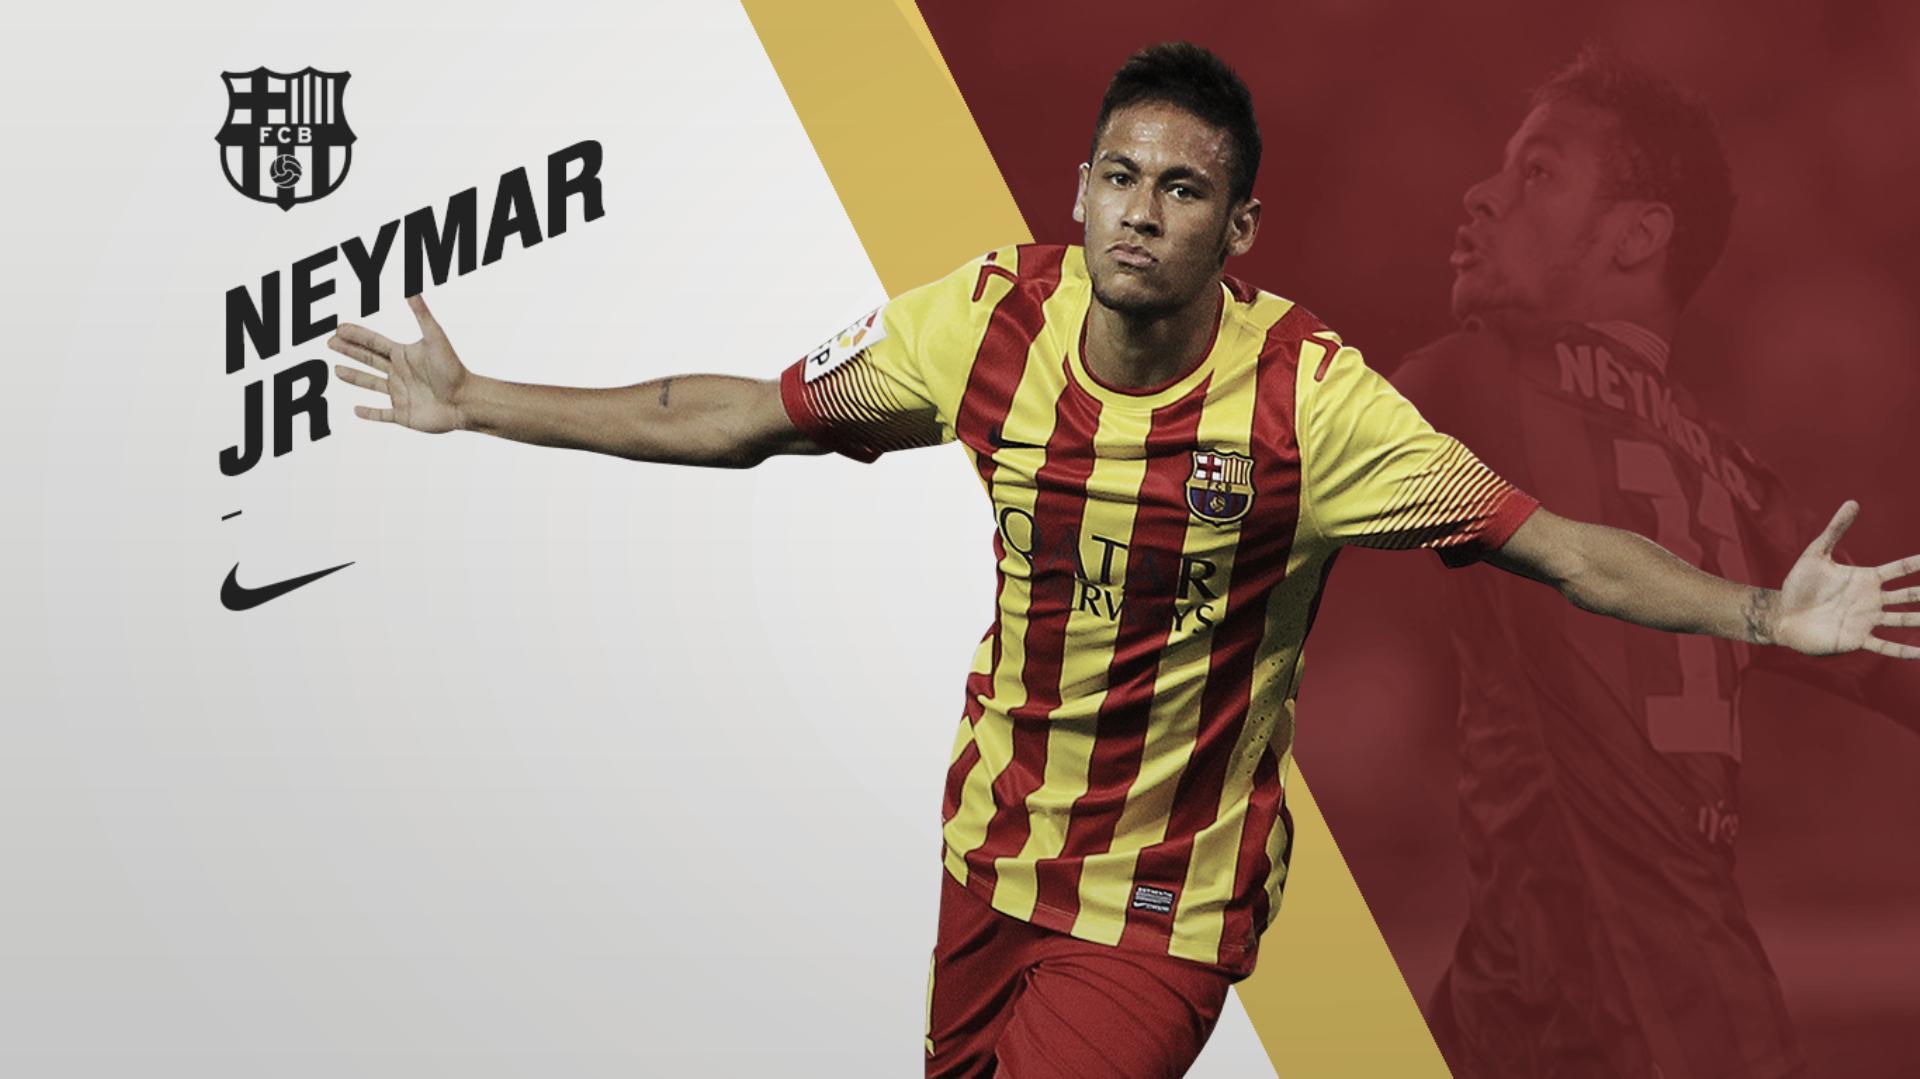 neymar jr wallpapers 2016 hd - wallpaper cave